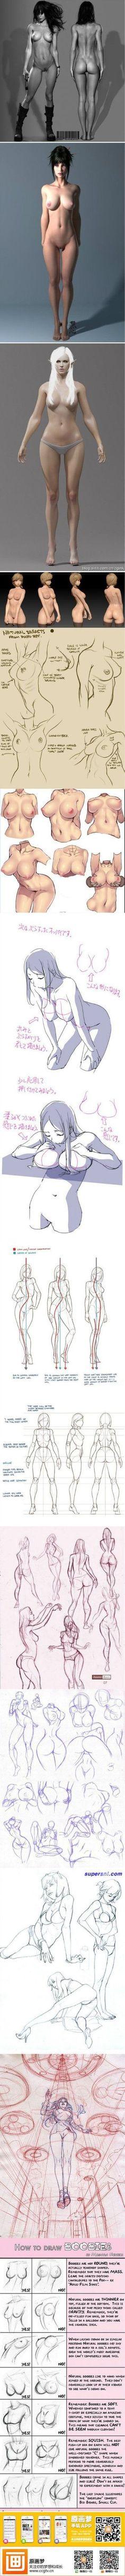 How to Draw the Female Face   Body anatomy. How to draw female body.: